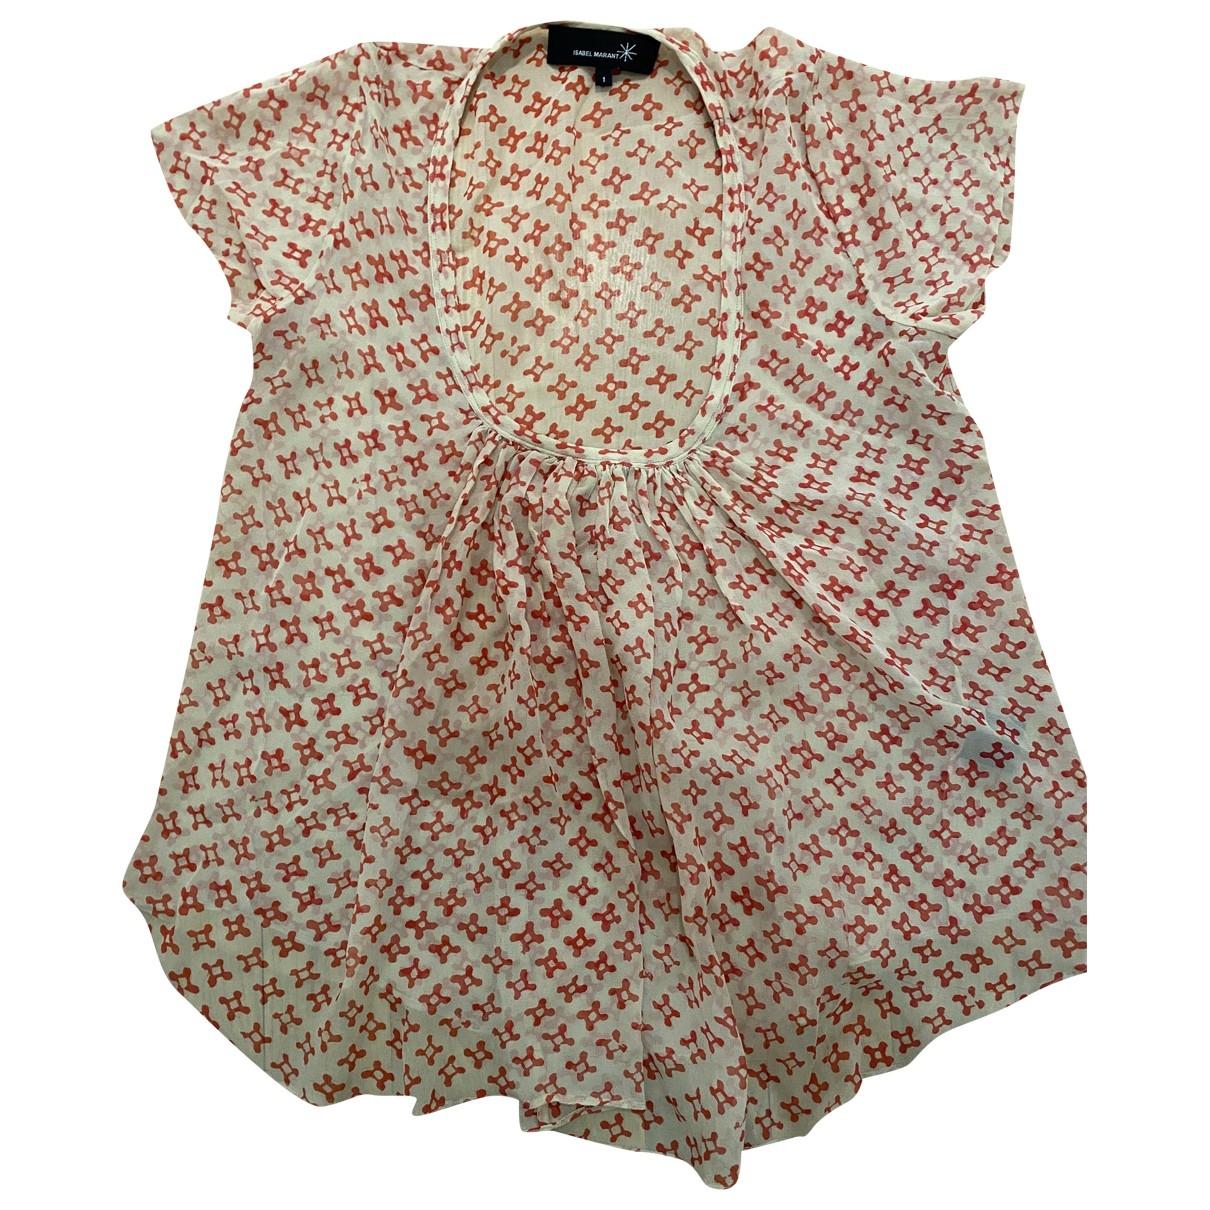 Isabel Marant Etoile \N Top in  Beige Polyester